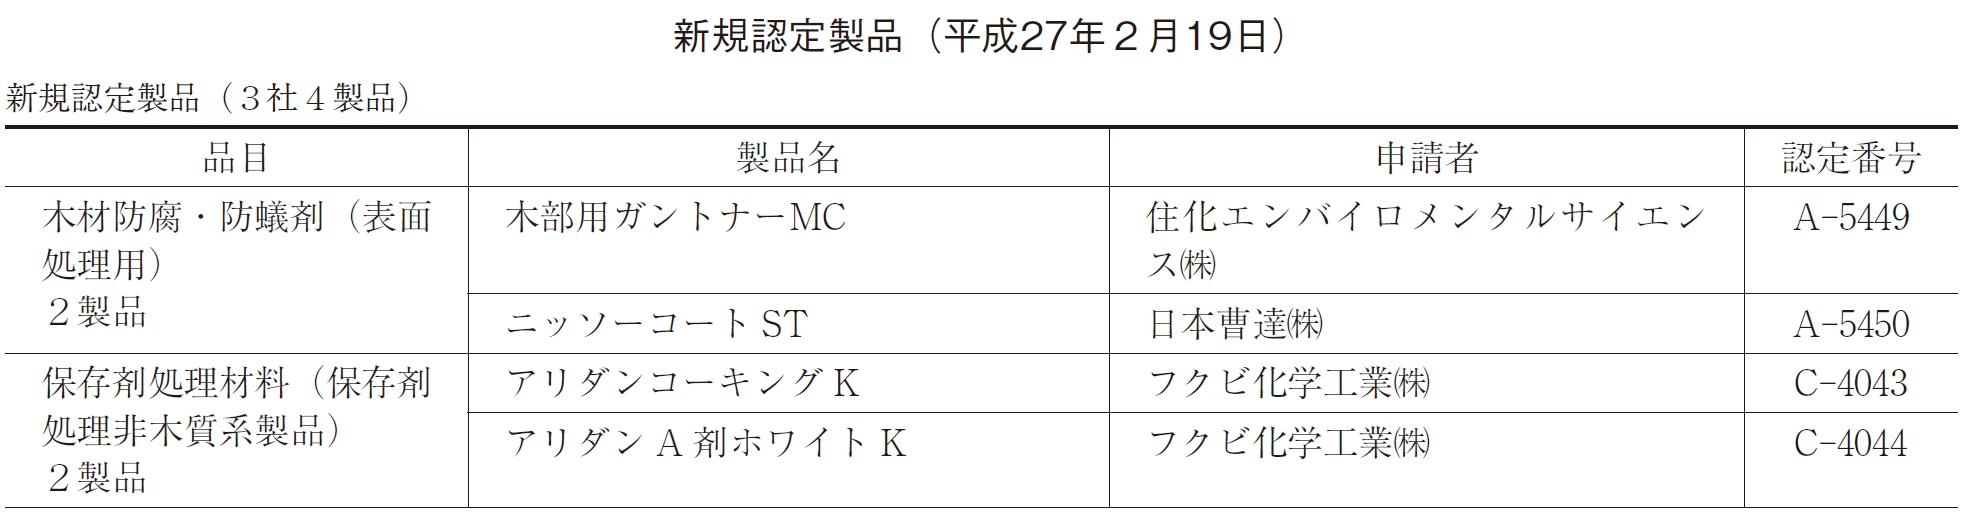 http://www.mokuzaihozon.org/about/jwpa_news/WS150330_1.JPG